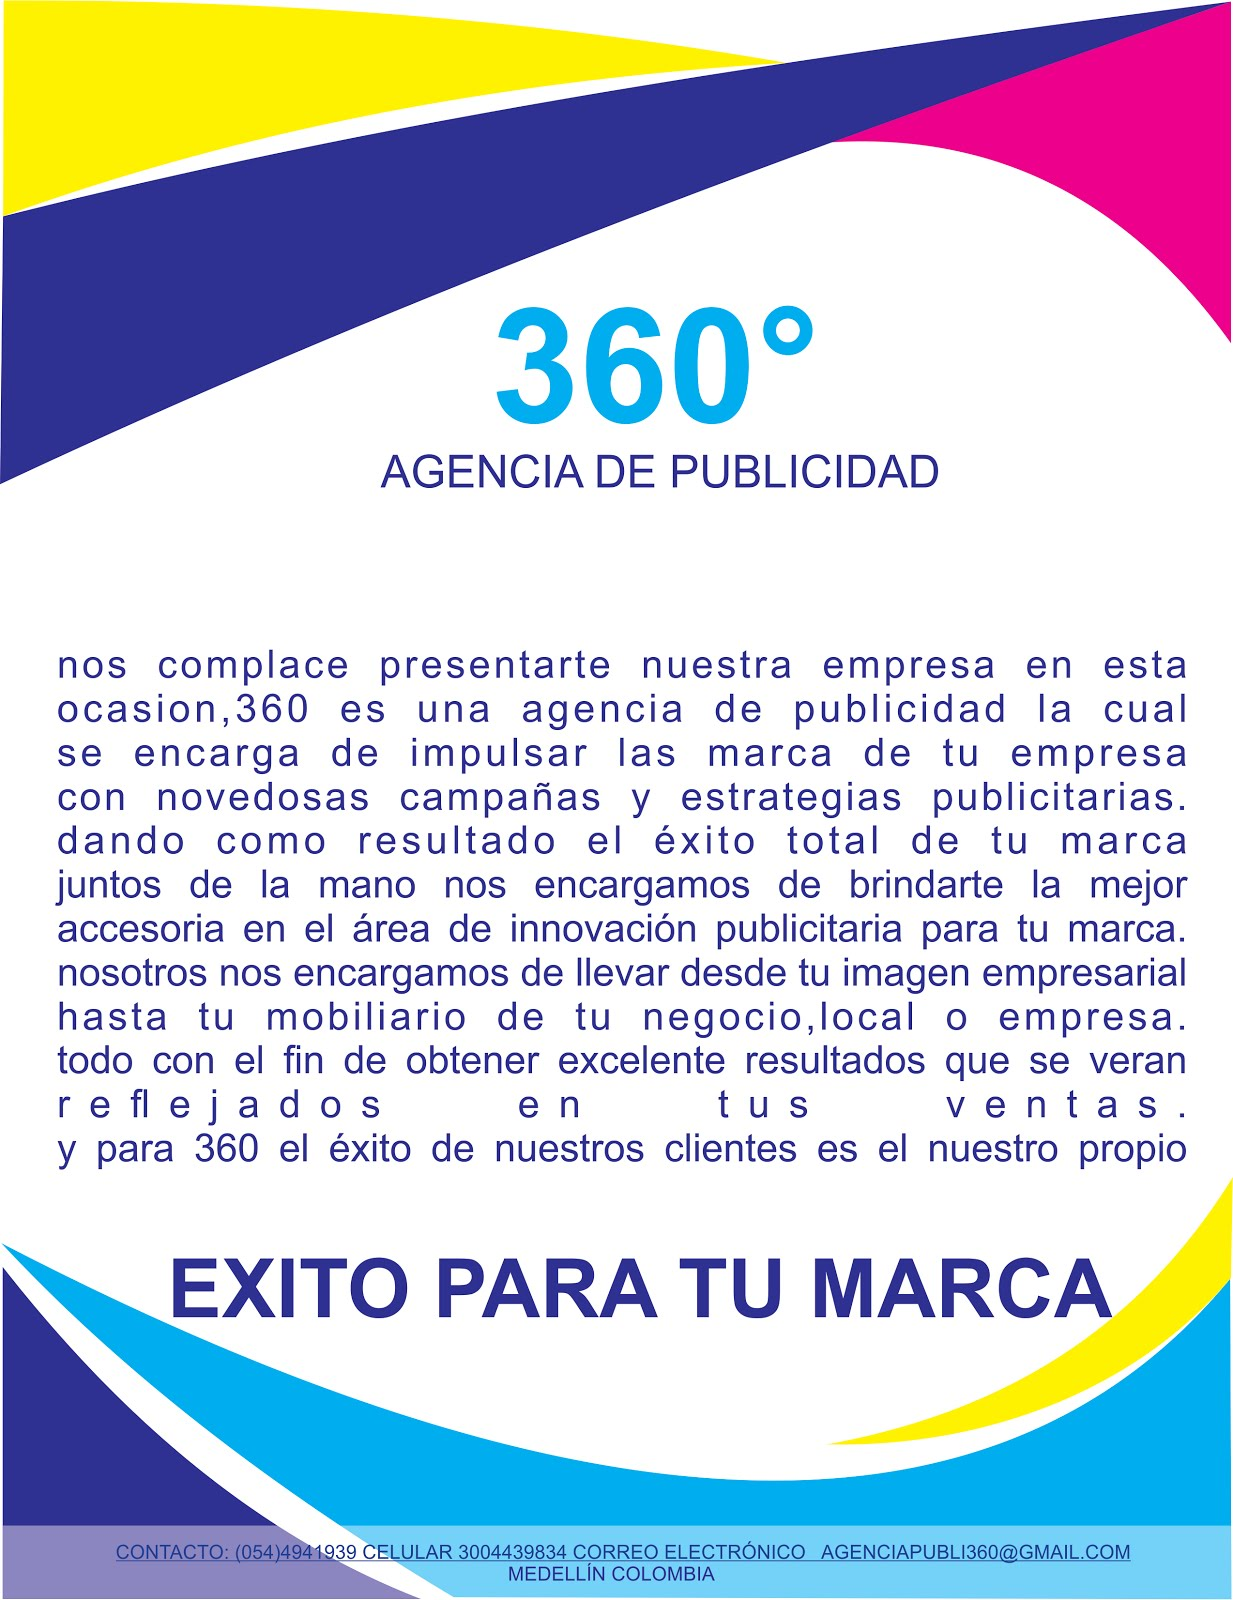 360 agencia de publicidad for Agencia de publicidad